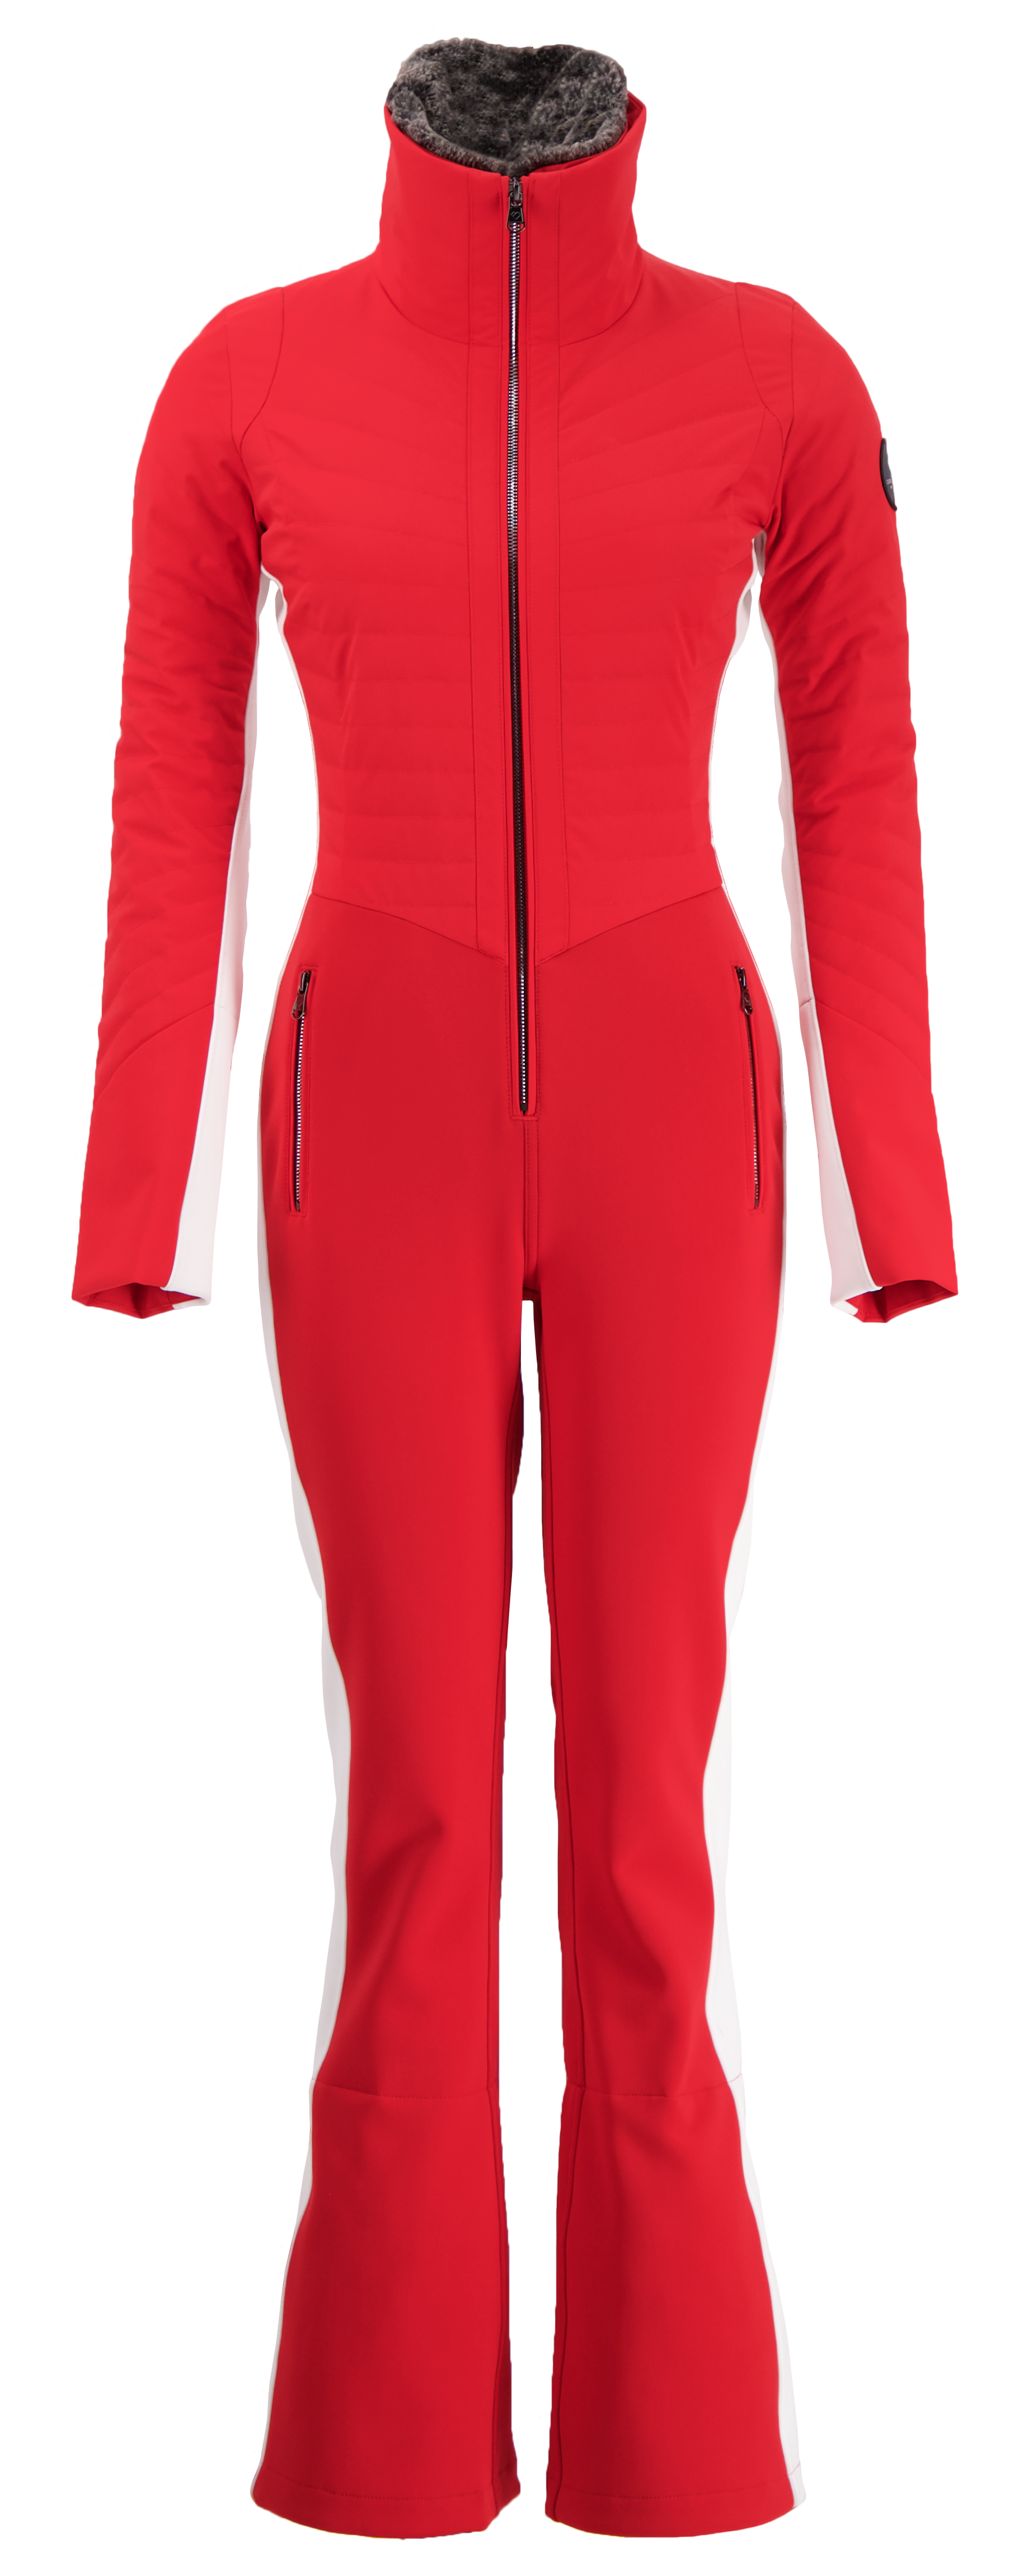 Spyder Bolt Shell Jacket